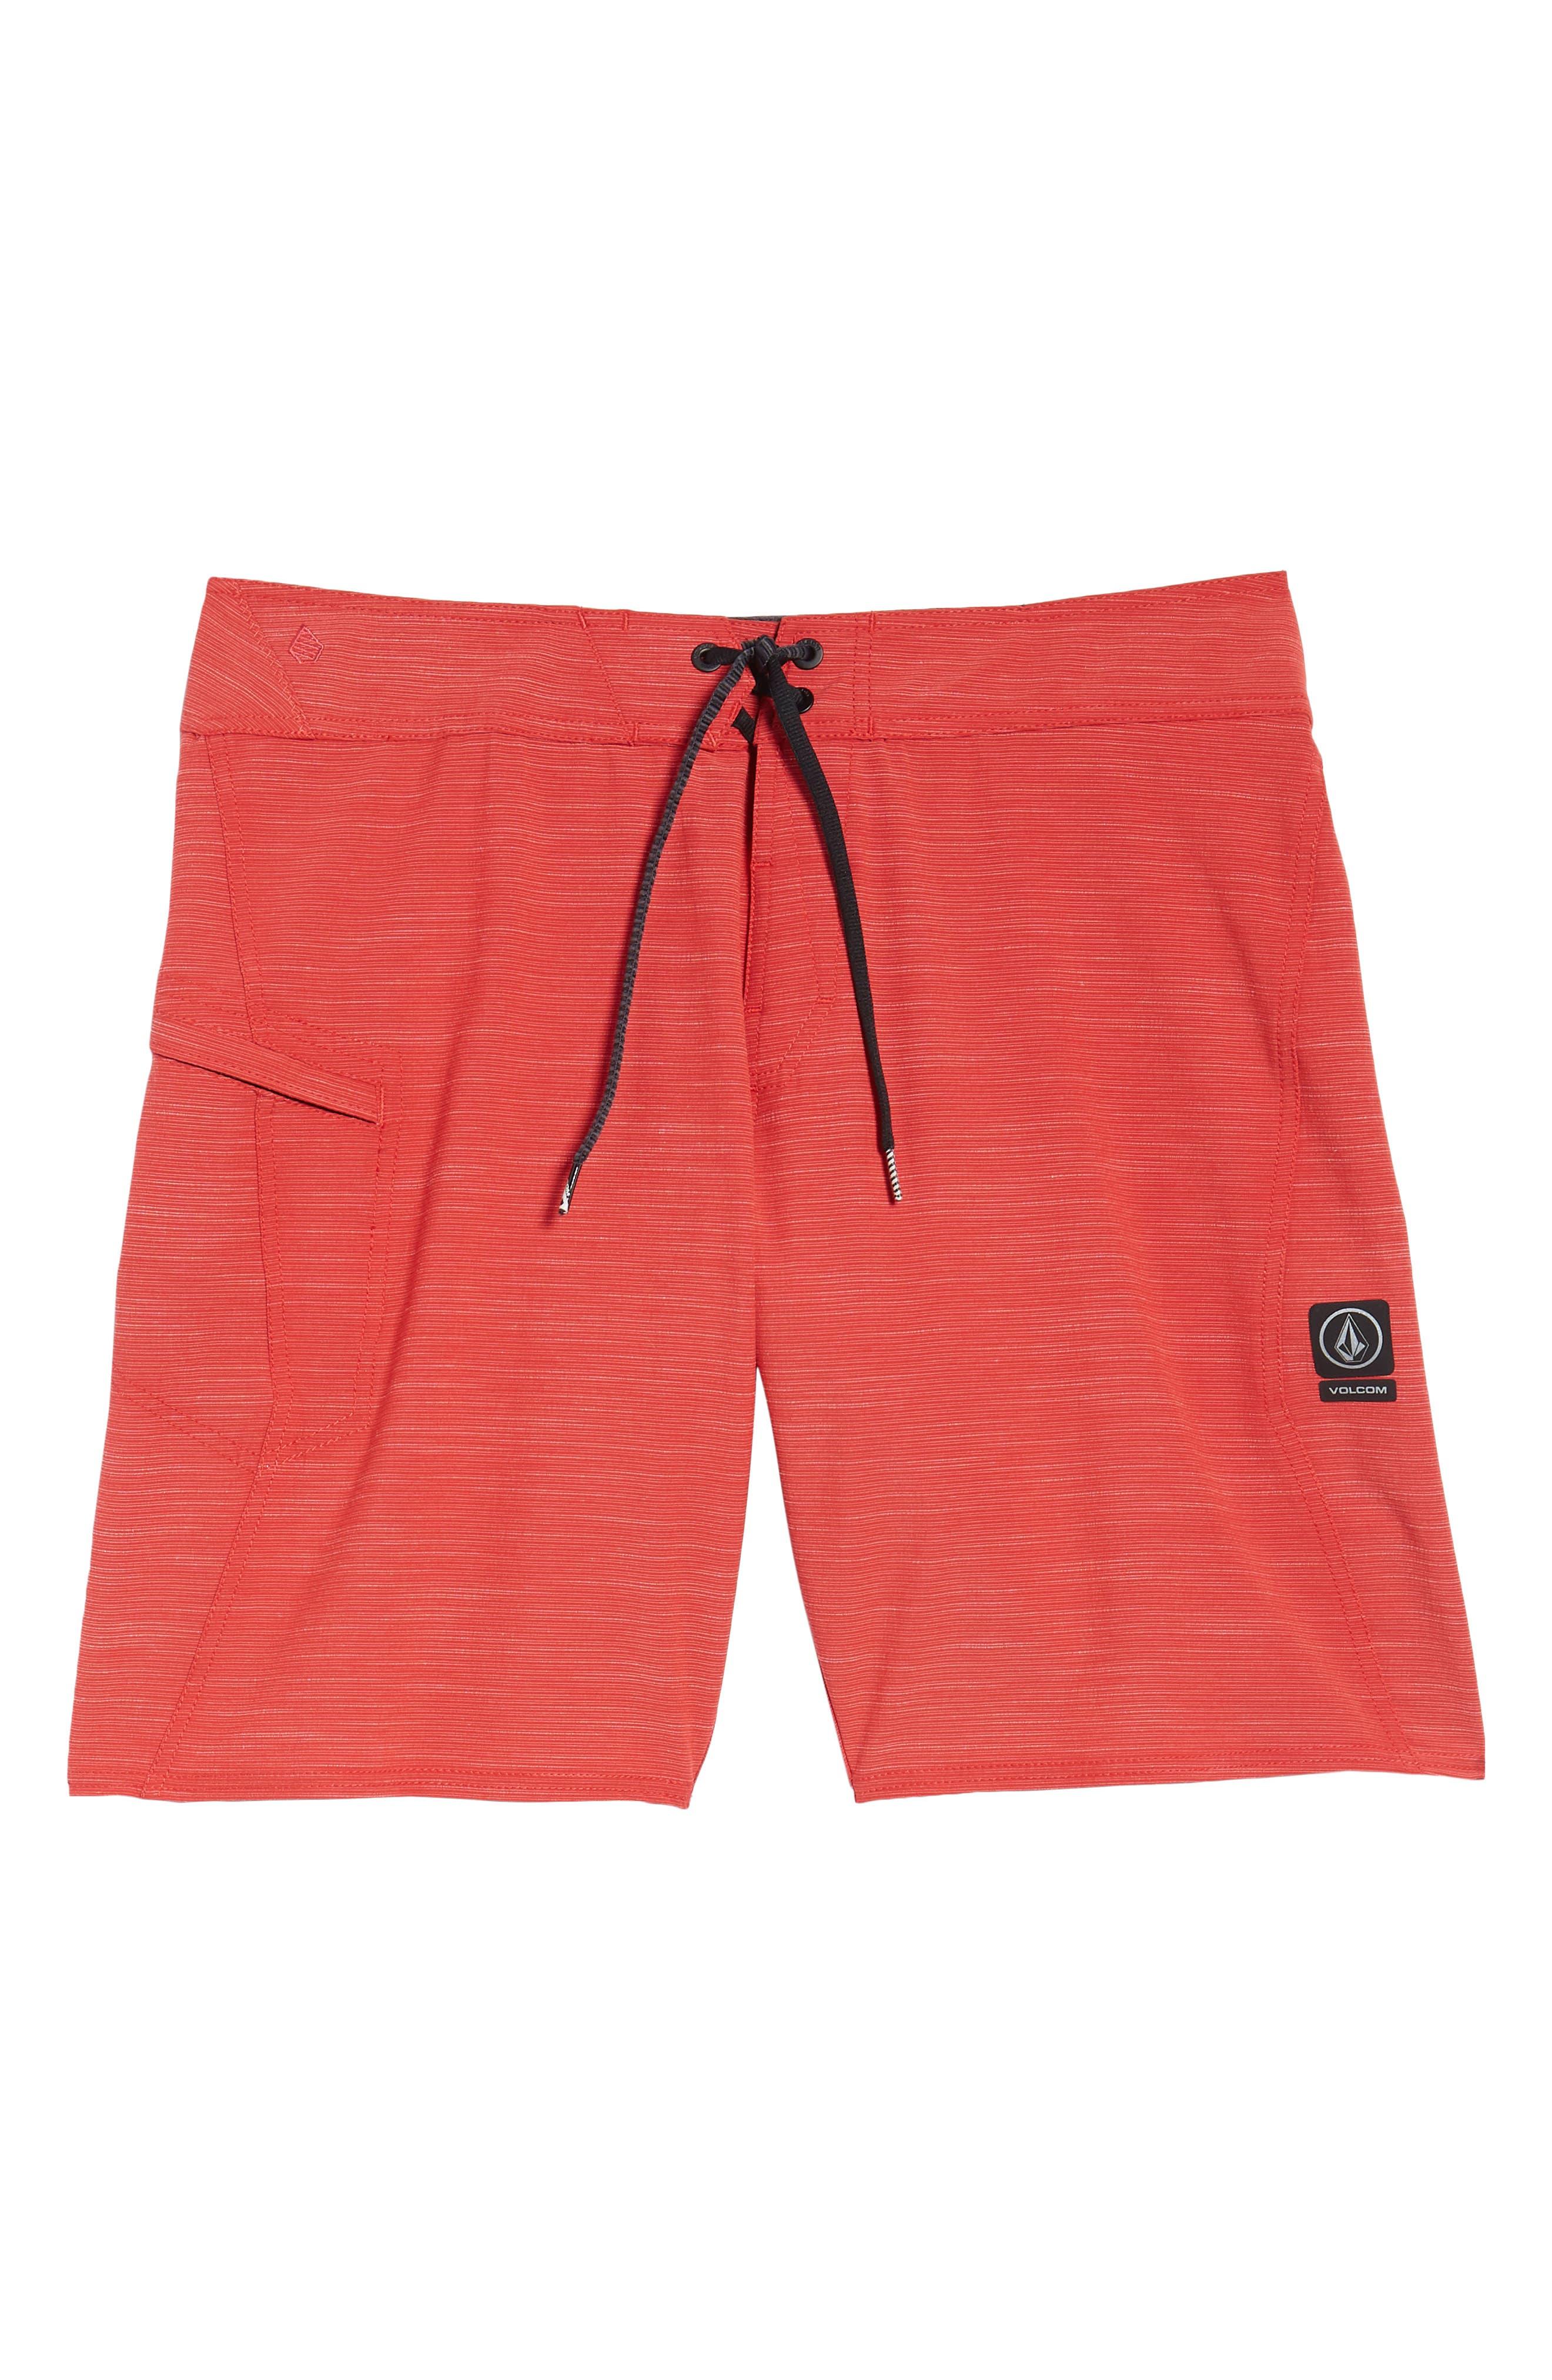 Lido Slub Modern Board Shorts,                             Alternate thumbnail 6, color,                             RED